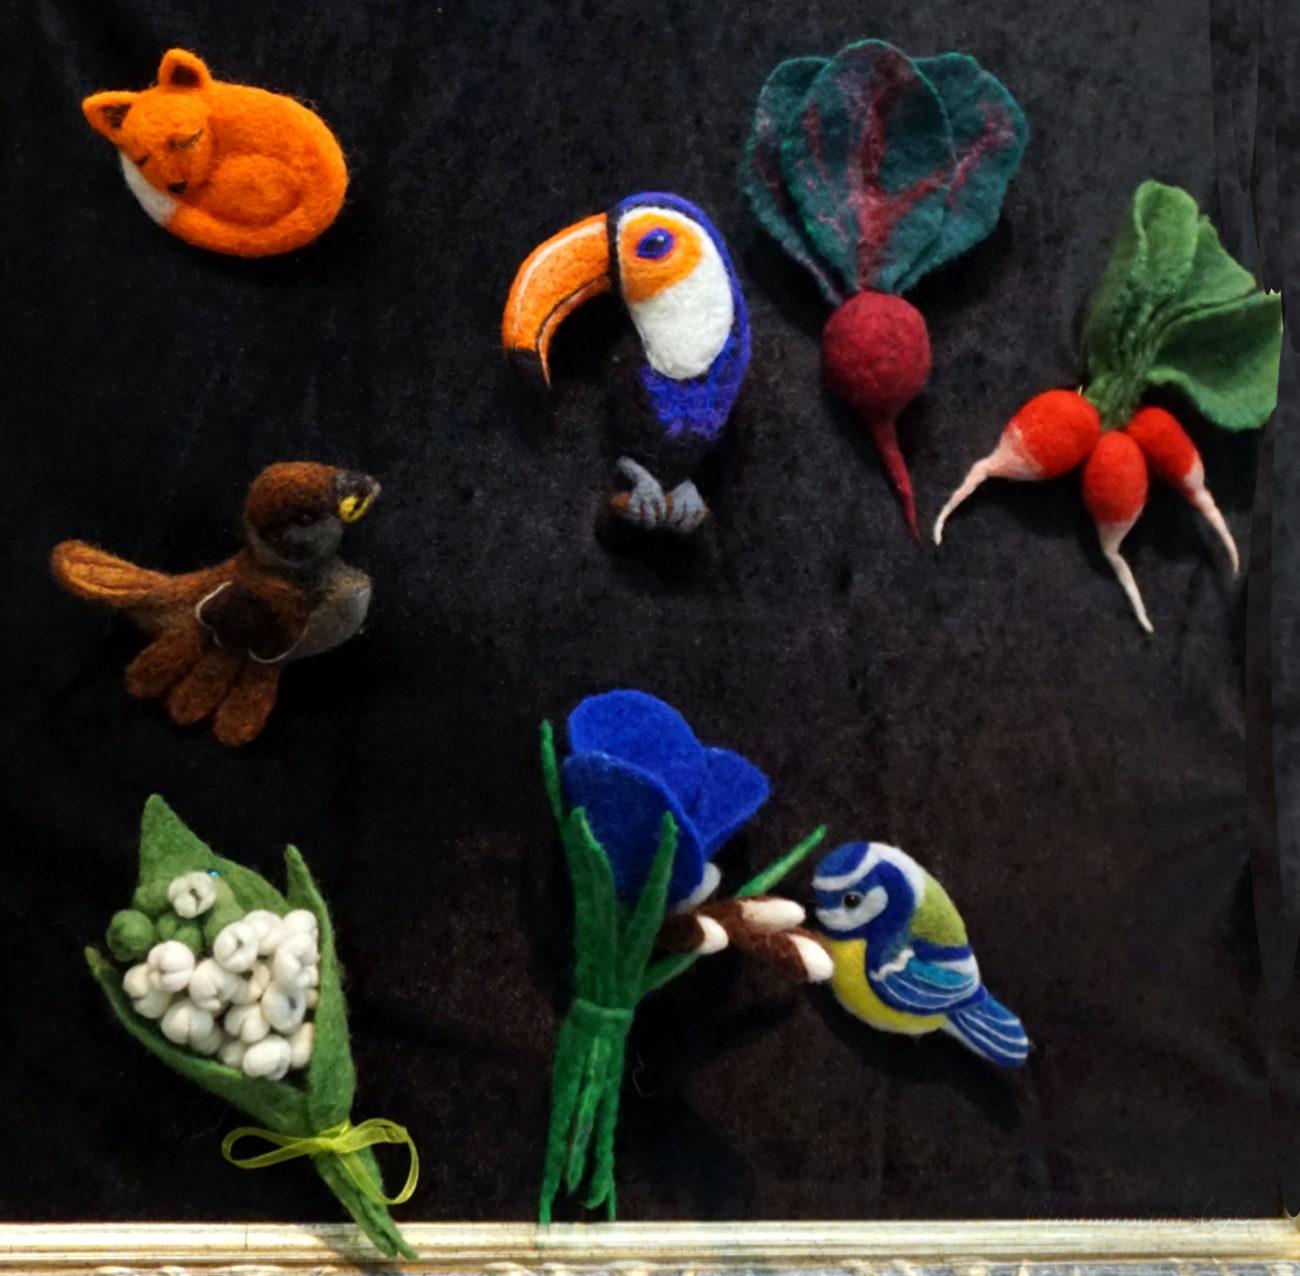 broshki-figurki-iz-voiloka-designer-elena-basulina-na-bloshinom-rynke-na-tishinke